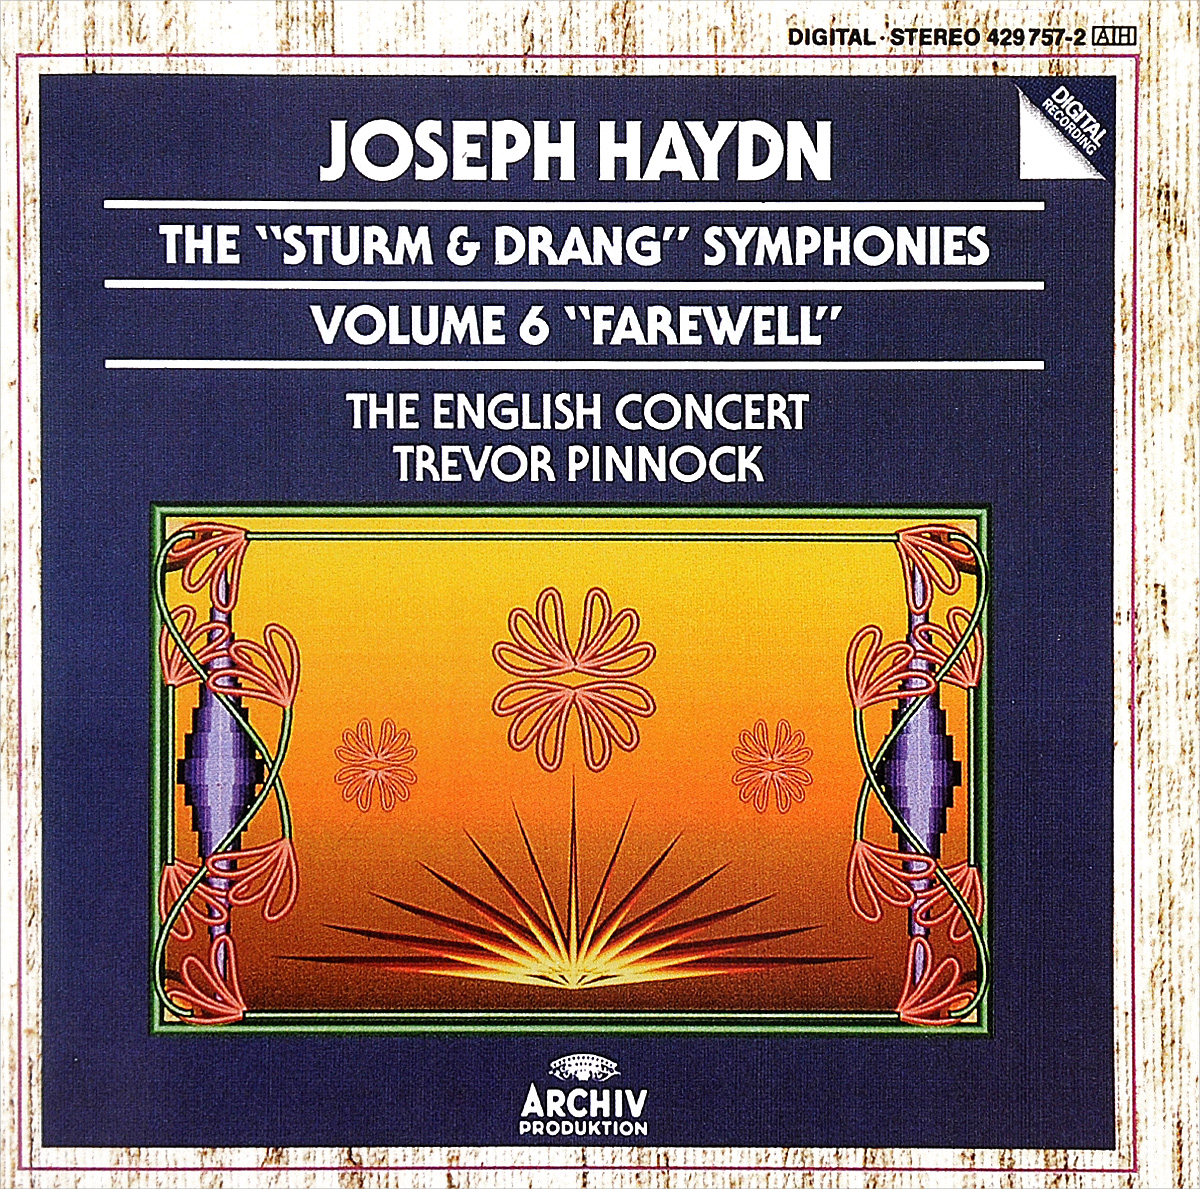 The English Concert,Тревор Пиннок Trevor Pinnock. Joseph Haydn. The Sturm & Drang Symphonies. Volume 6. Farewell тревор пиннок the english concert саймон престон trevor pinnock handel 5 organ concertos